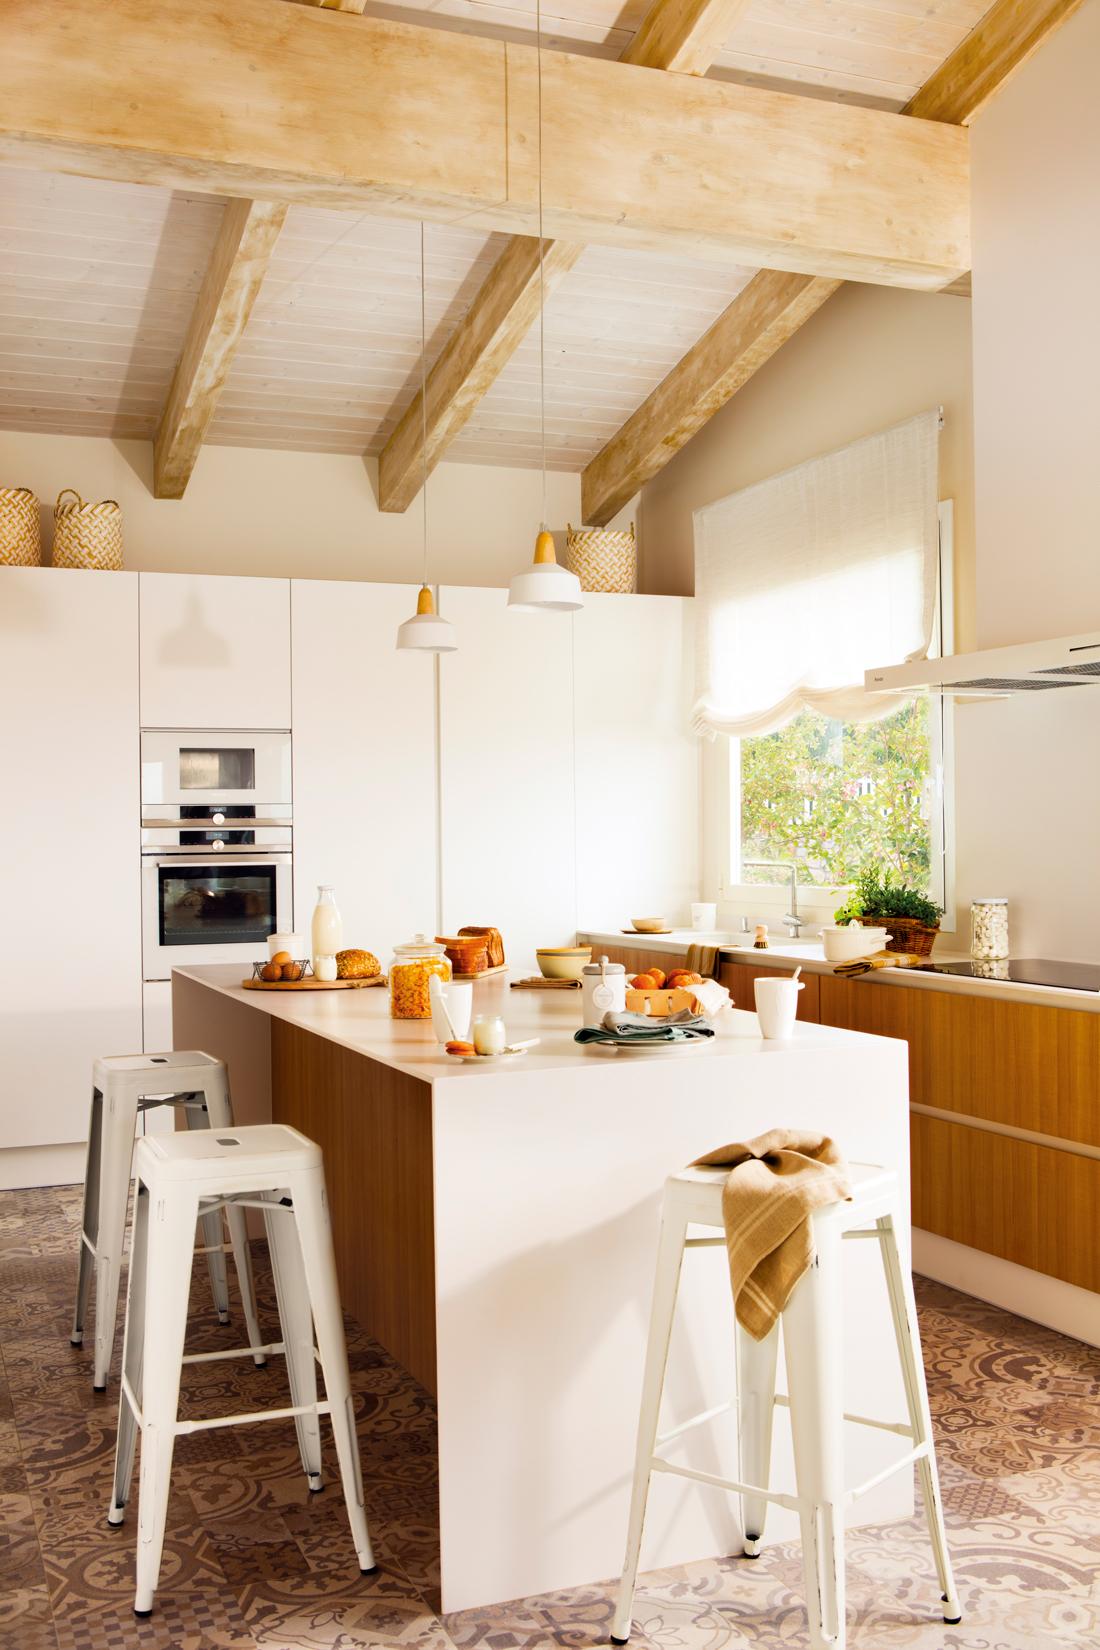 Detalles Para Renovar Tu Cocina # Muebles Blancos